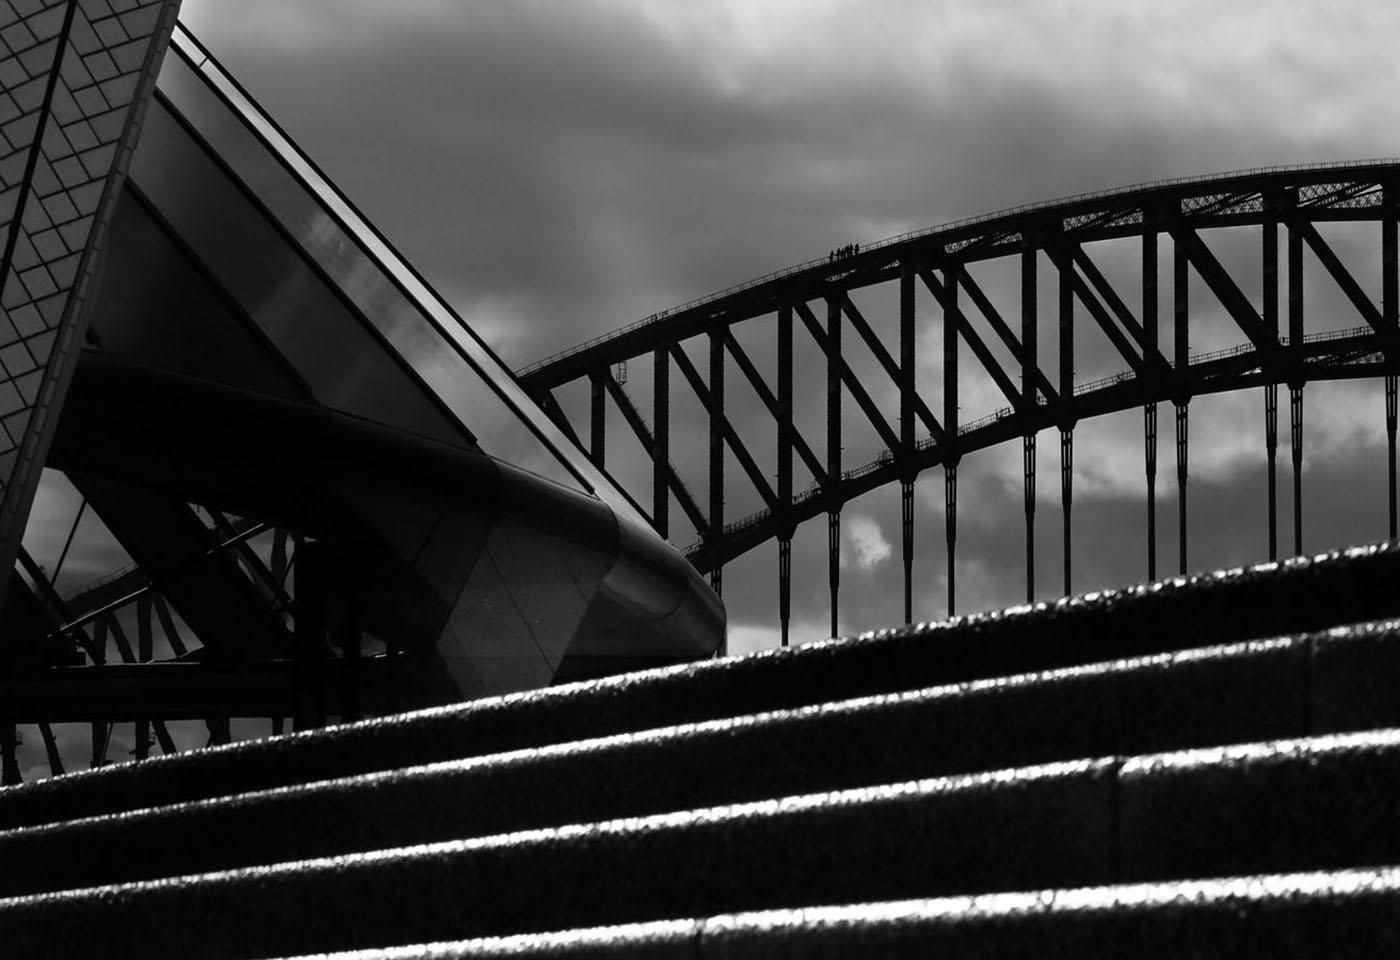 Landscape black and white image of harbour bridge